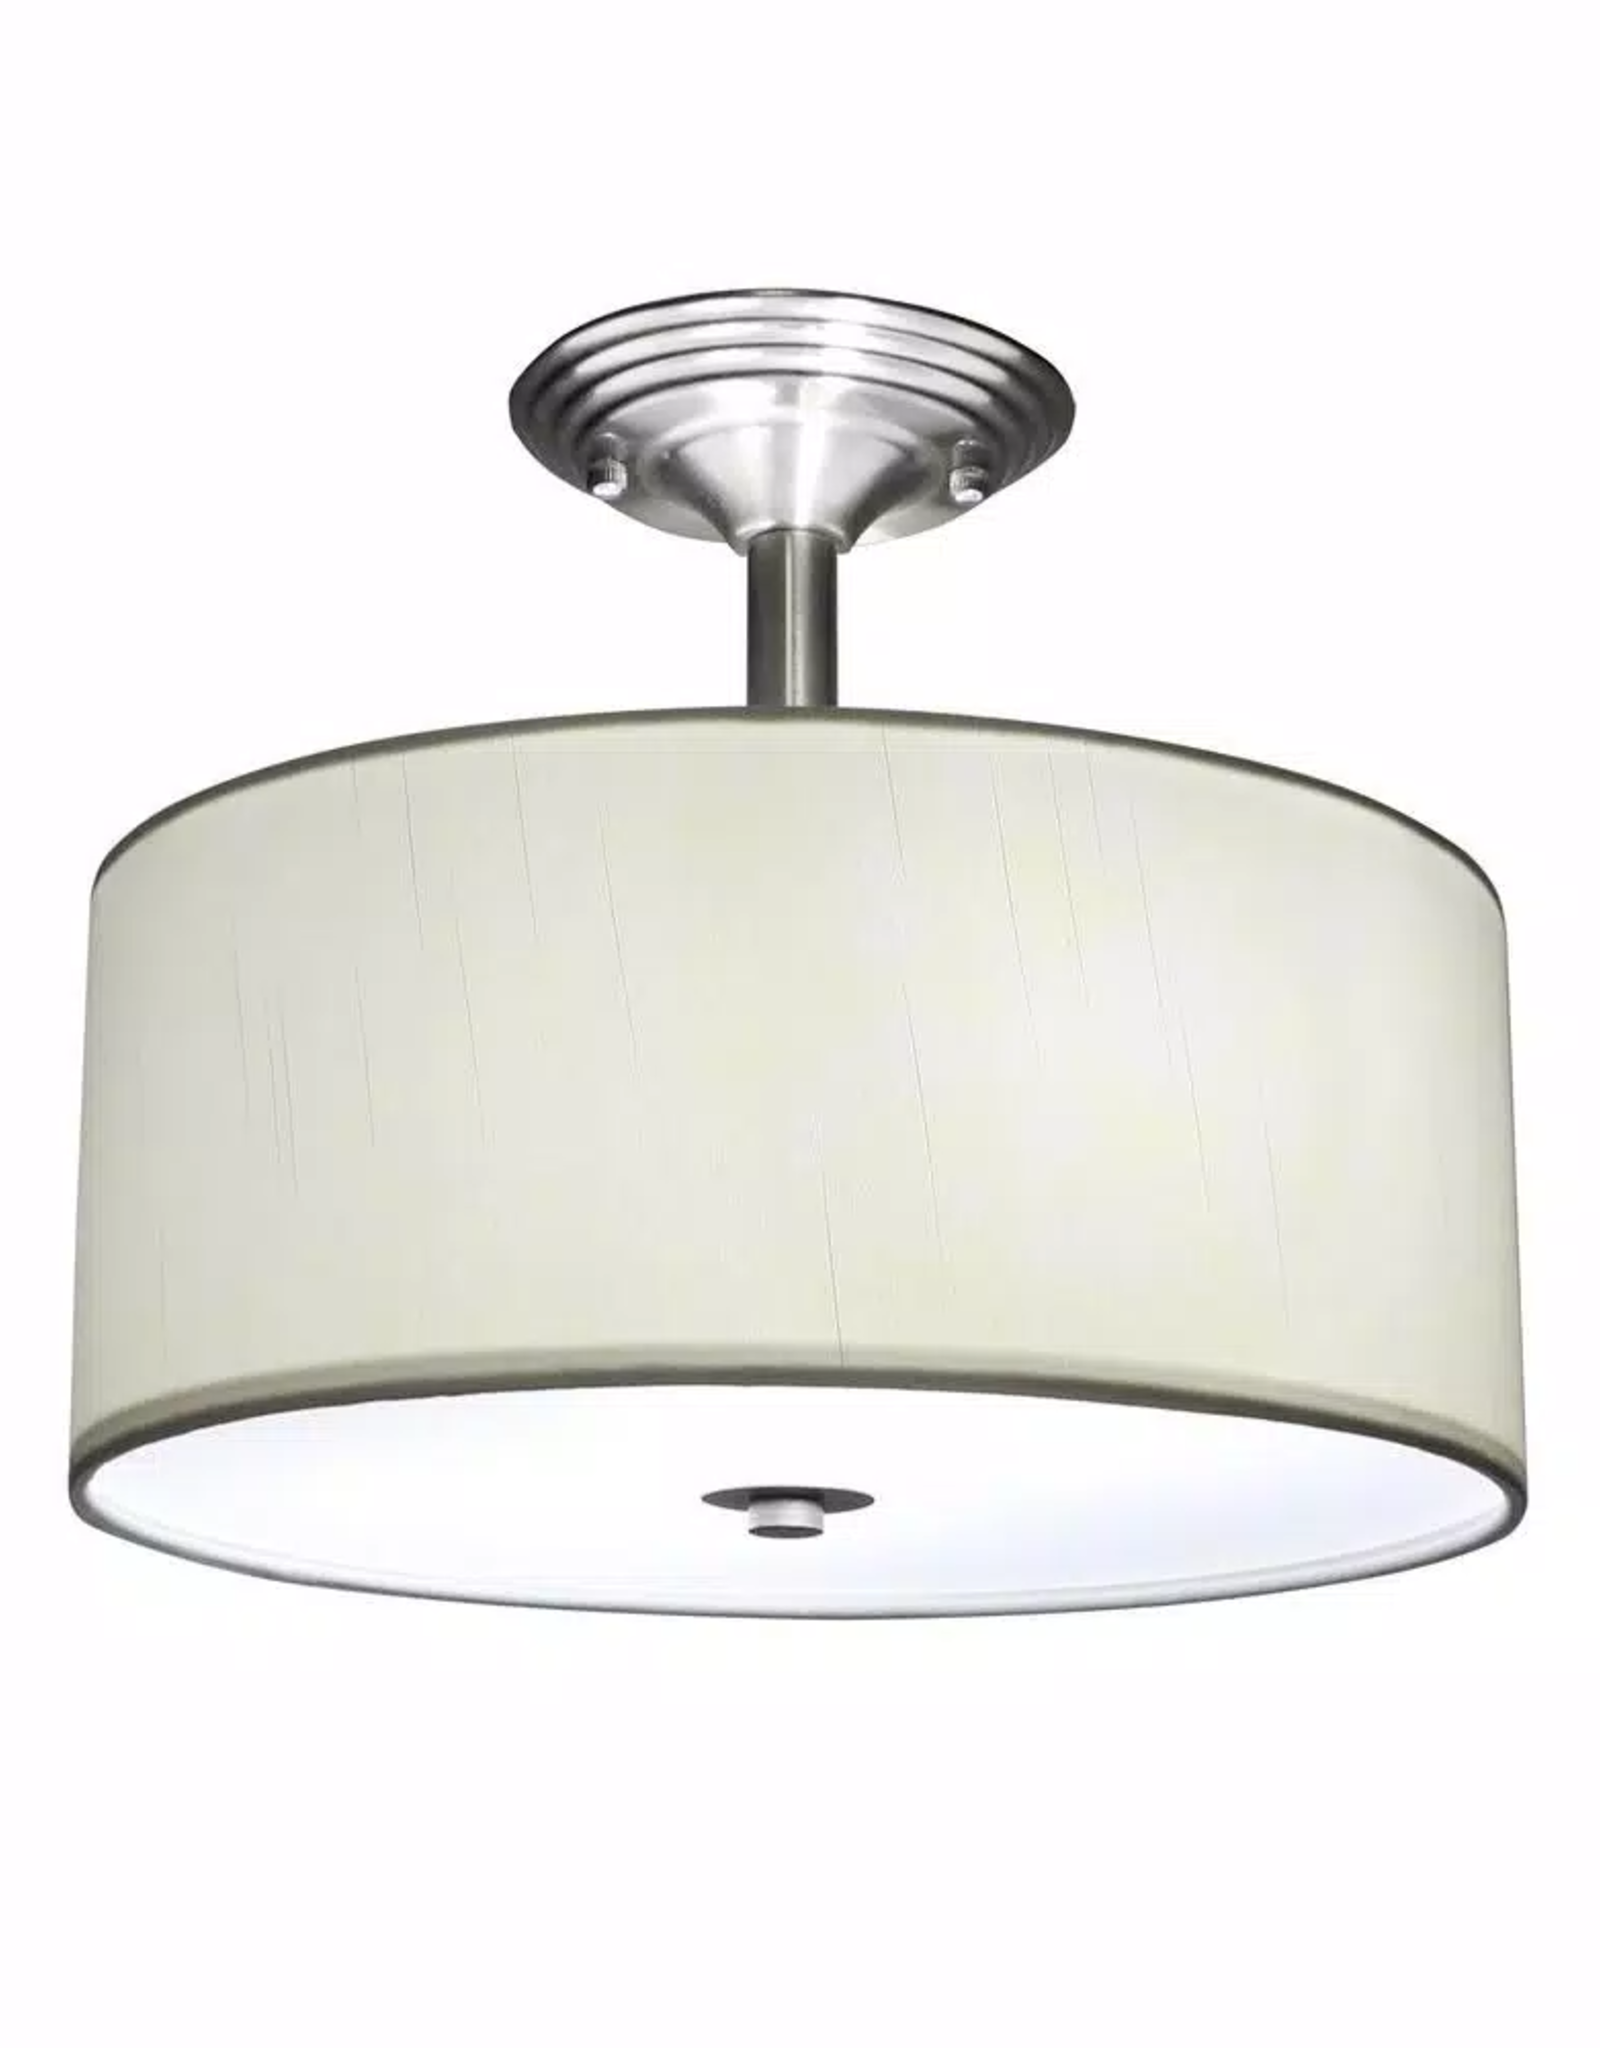 Merra 13 in. 2-Light Brushed Nickel Semi-Flush Mount Light with Fabric Drum Shade